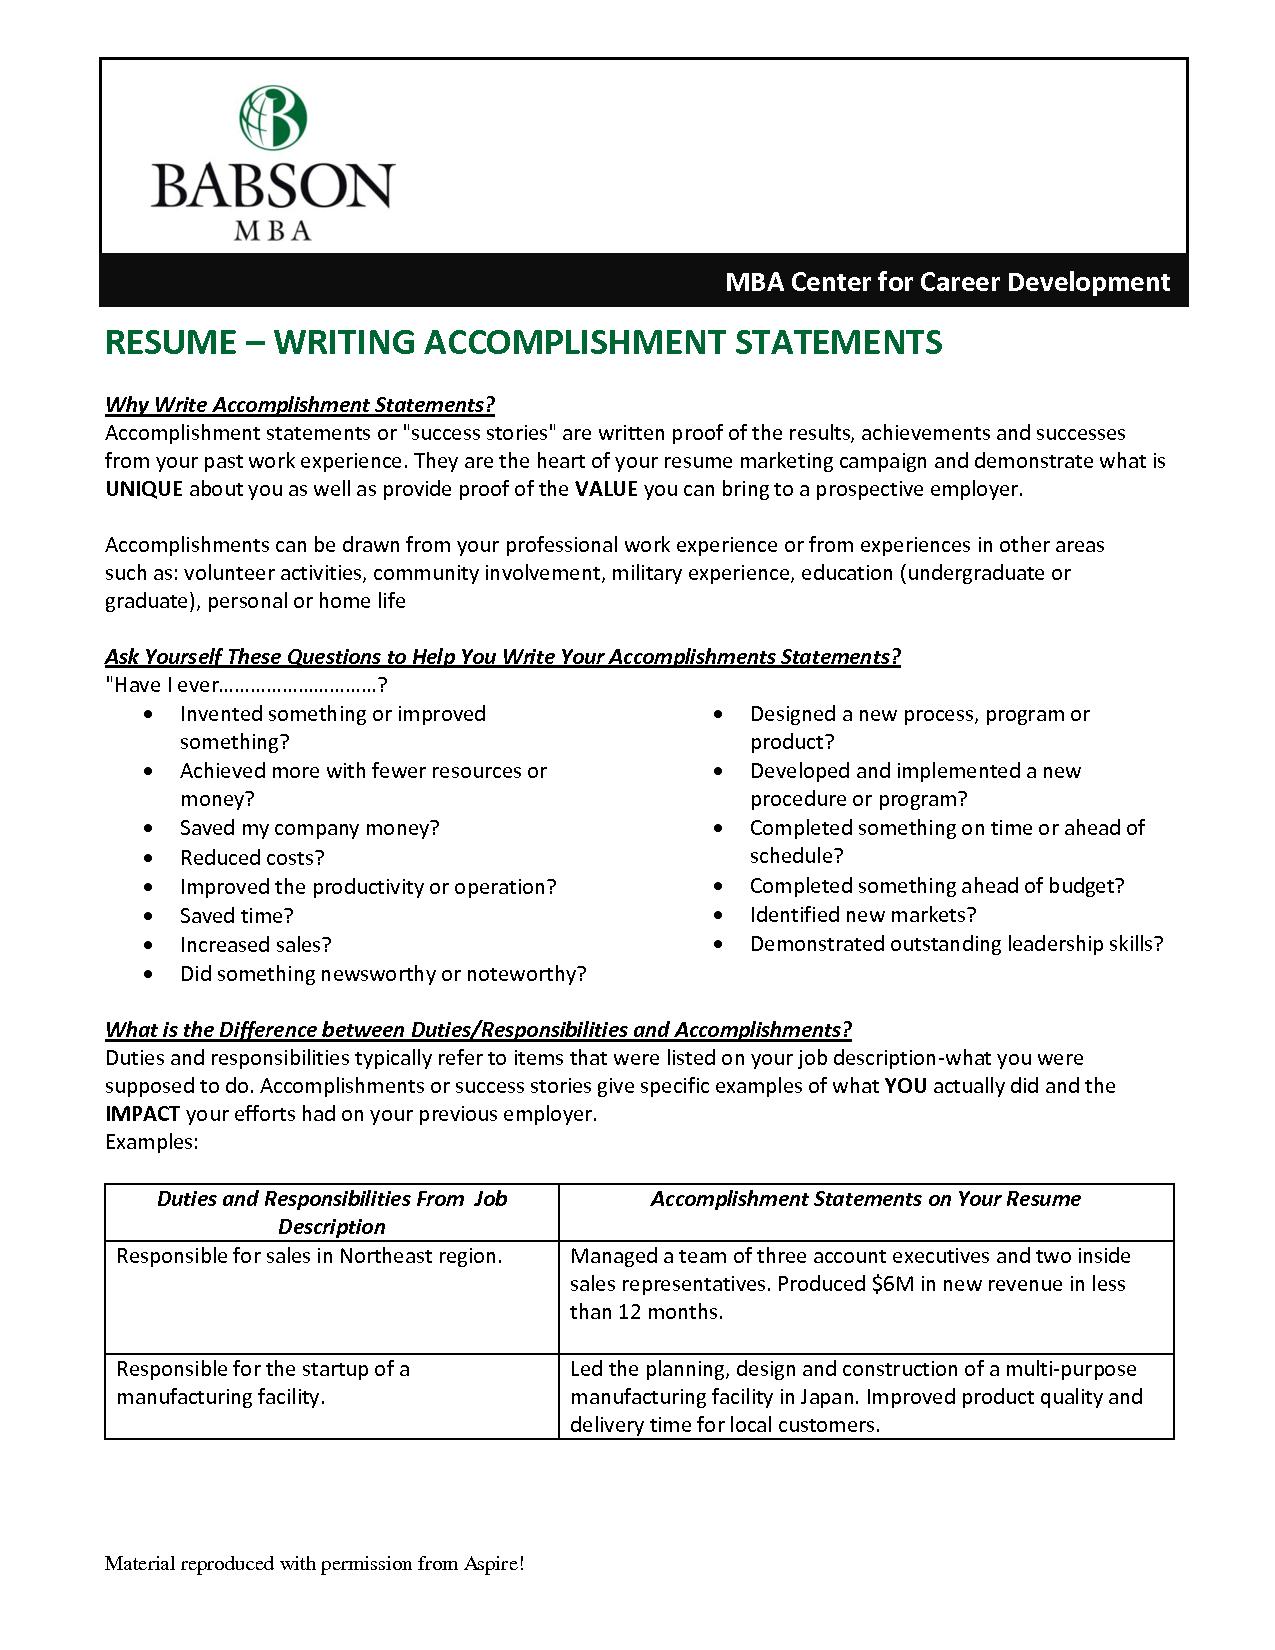 Accomplishments On Resume Examples